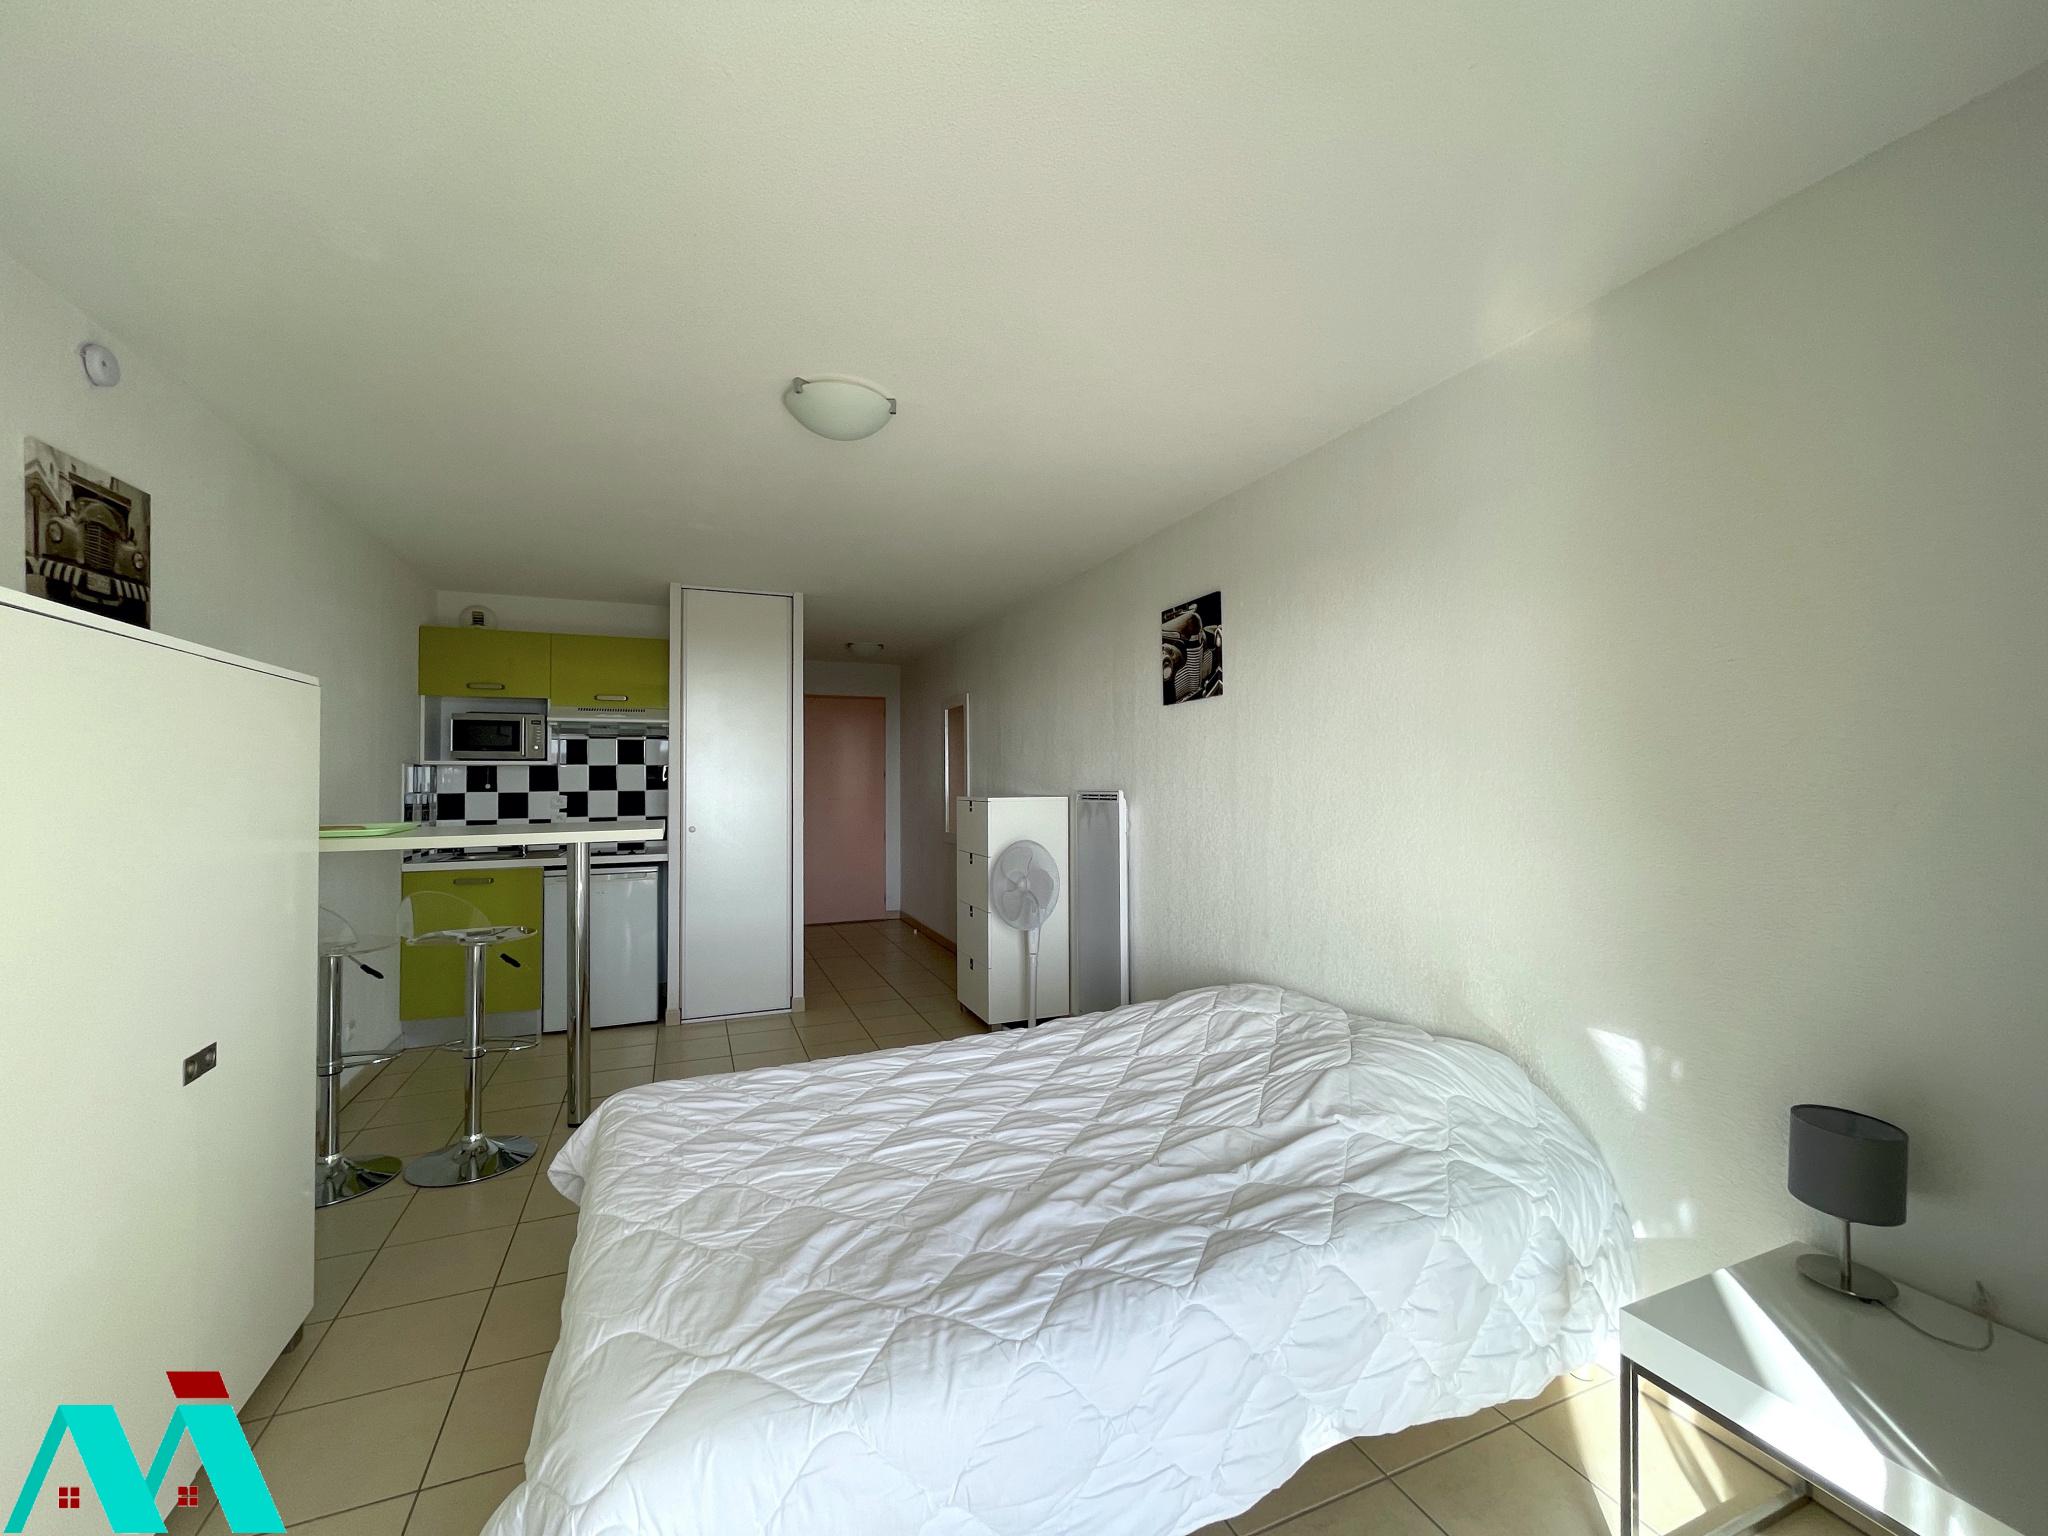 Appartement - Signes